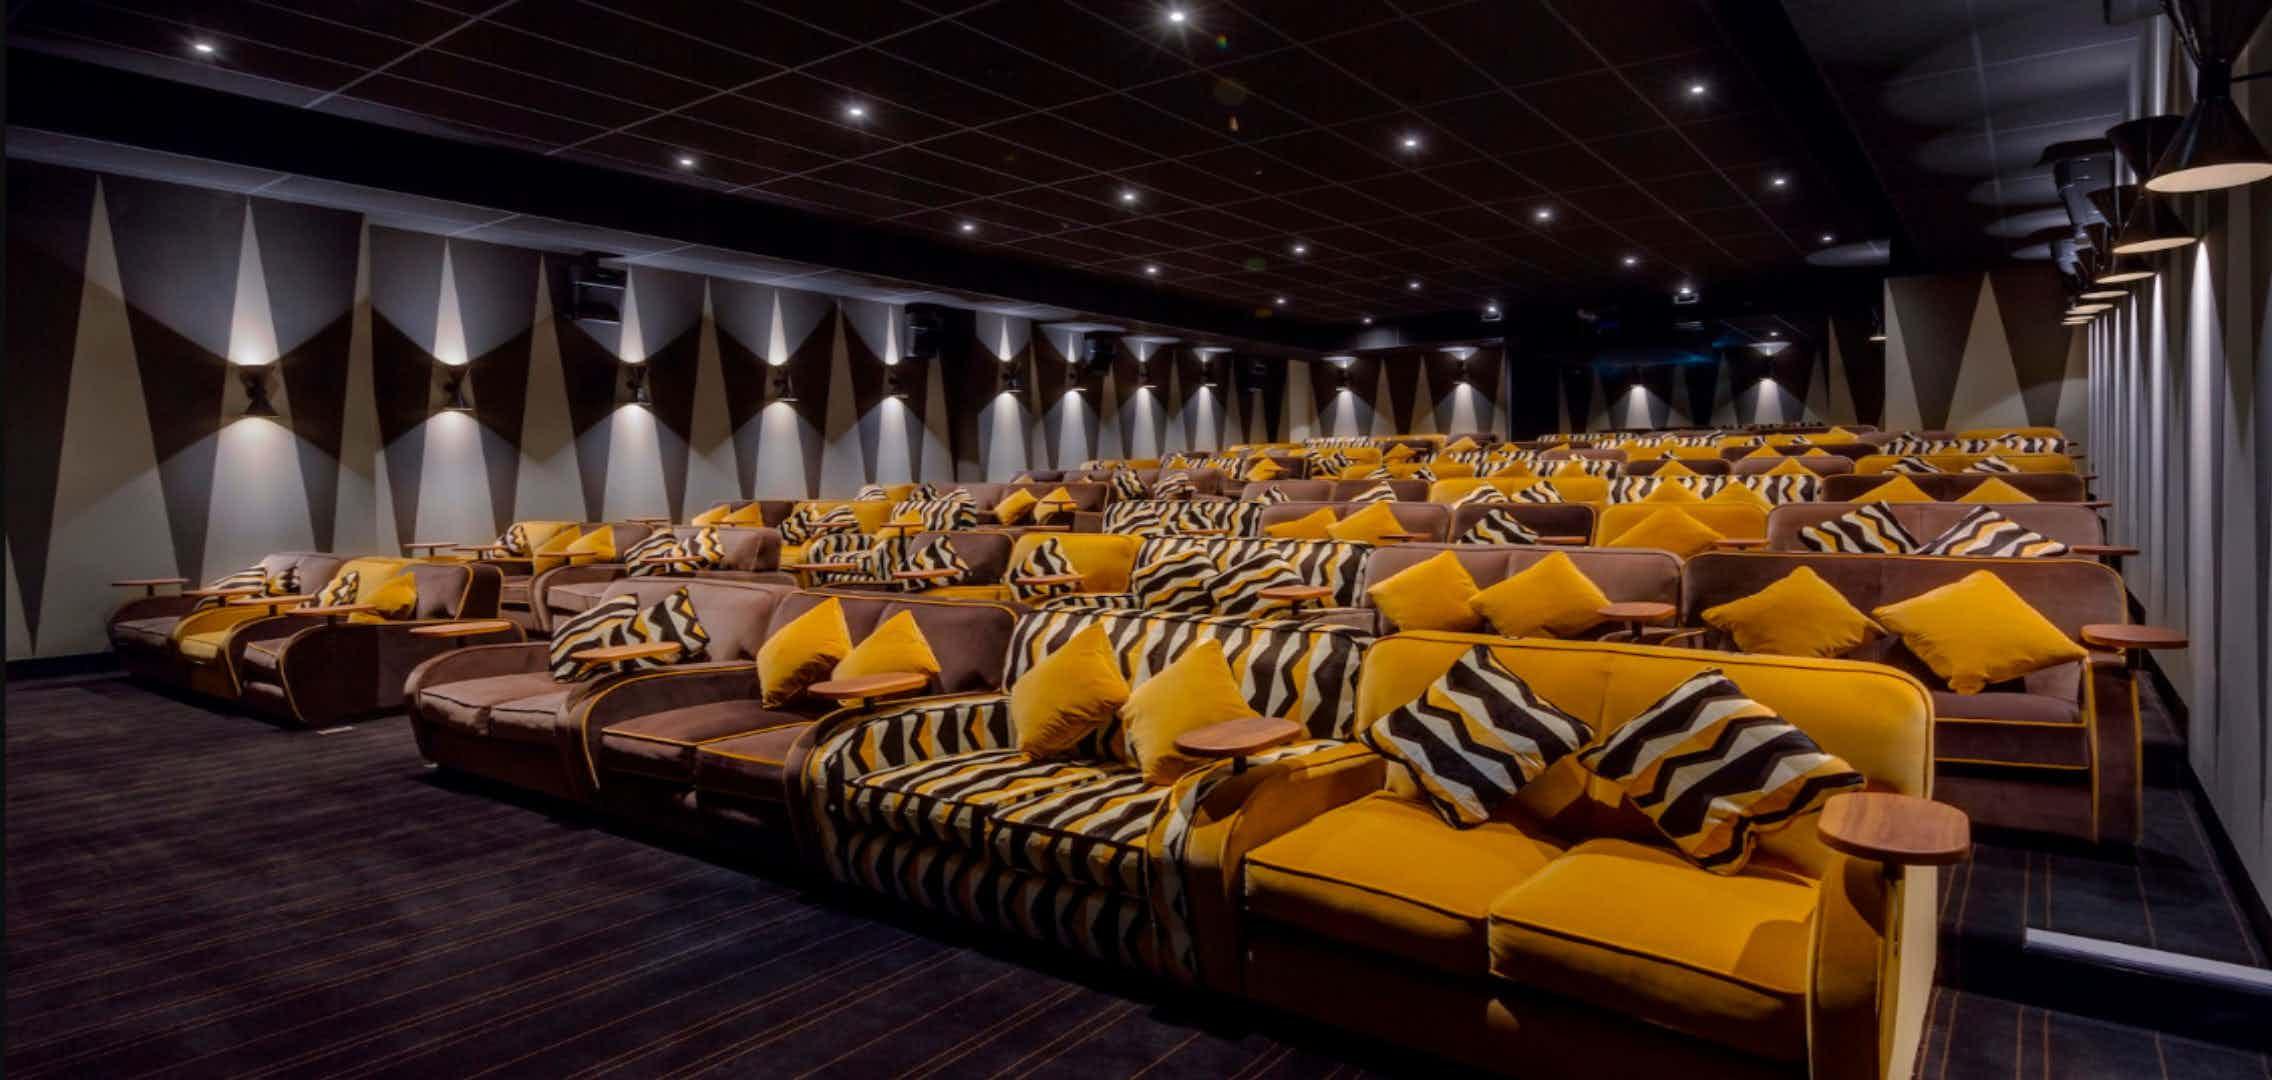 Screen 1, Everyman Cinema, Kings Cross